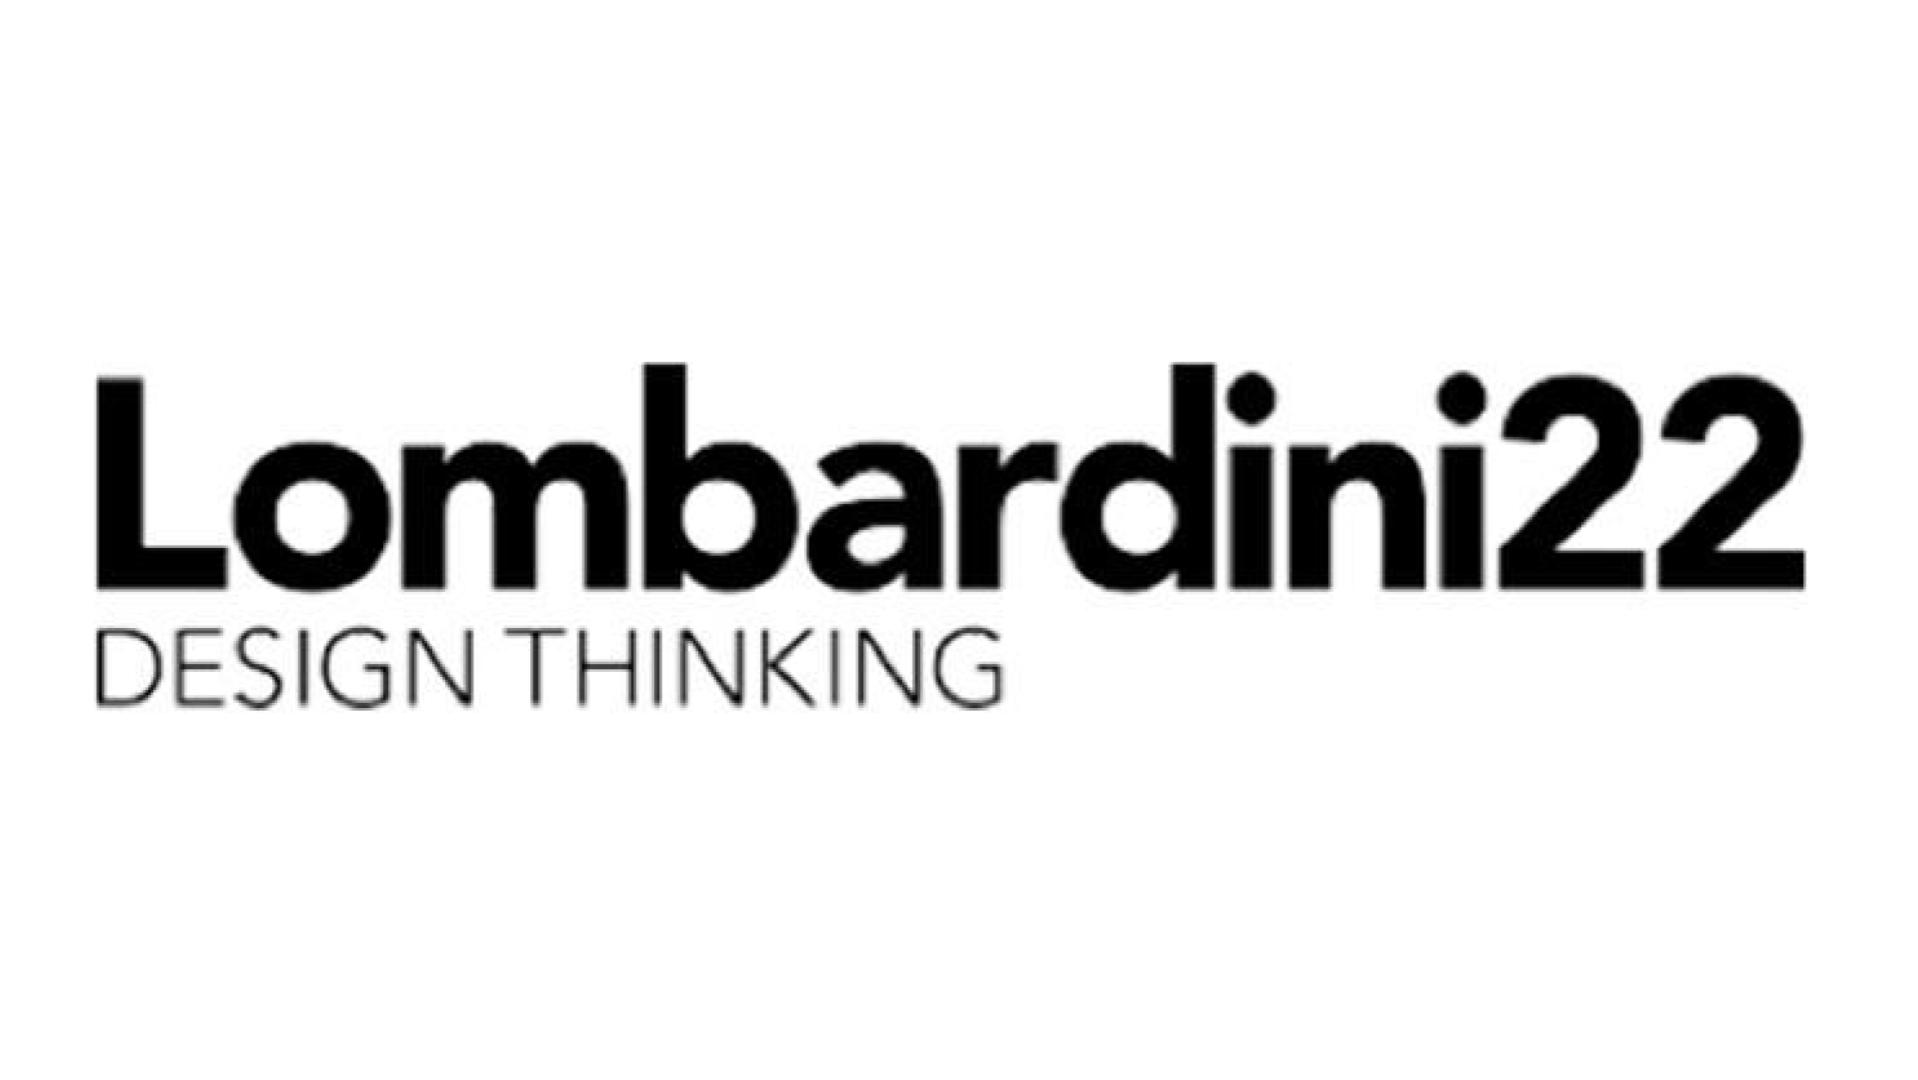 Lombardini22 Organisation logo